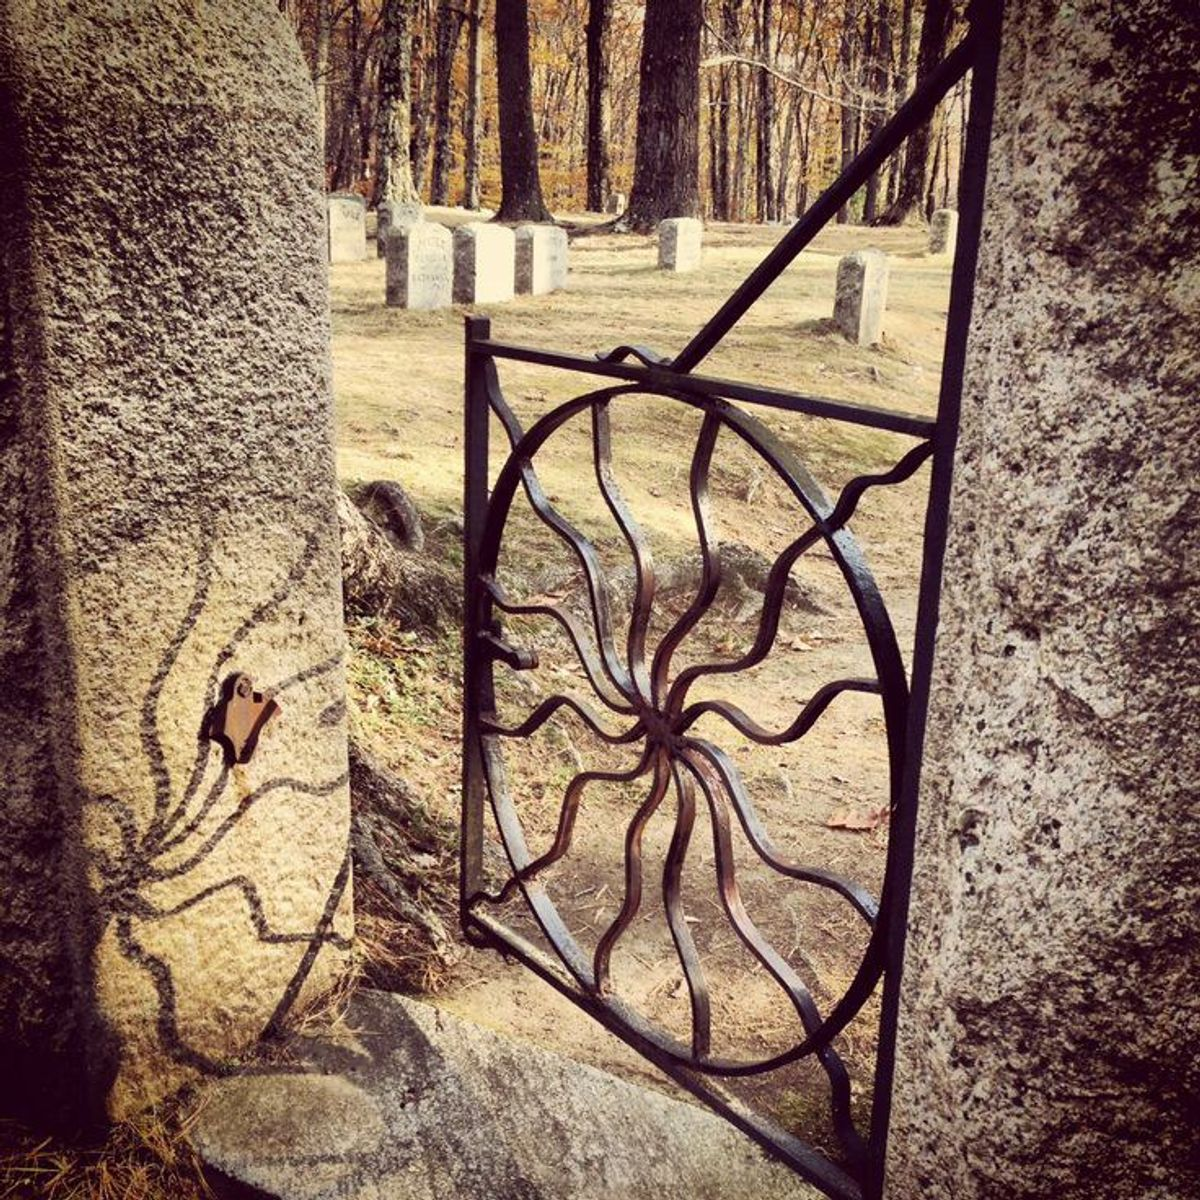 The Spider Gates, A Local Legend